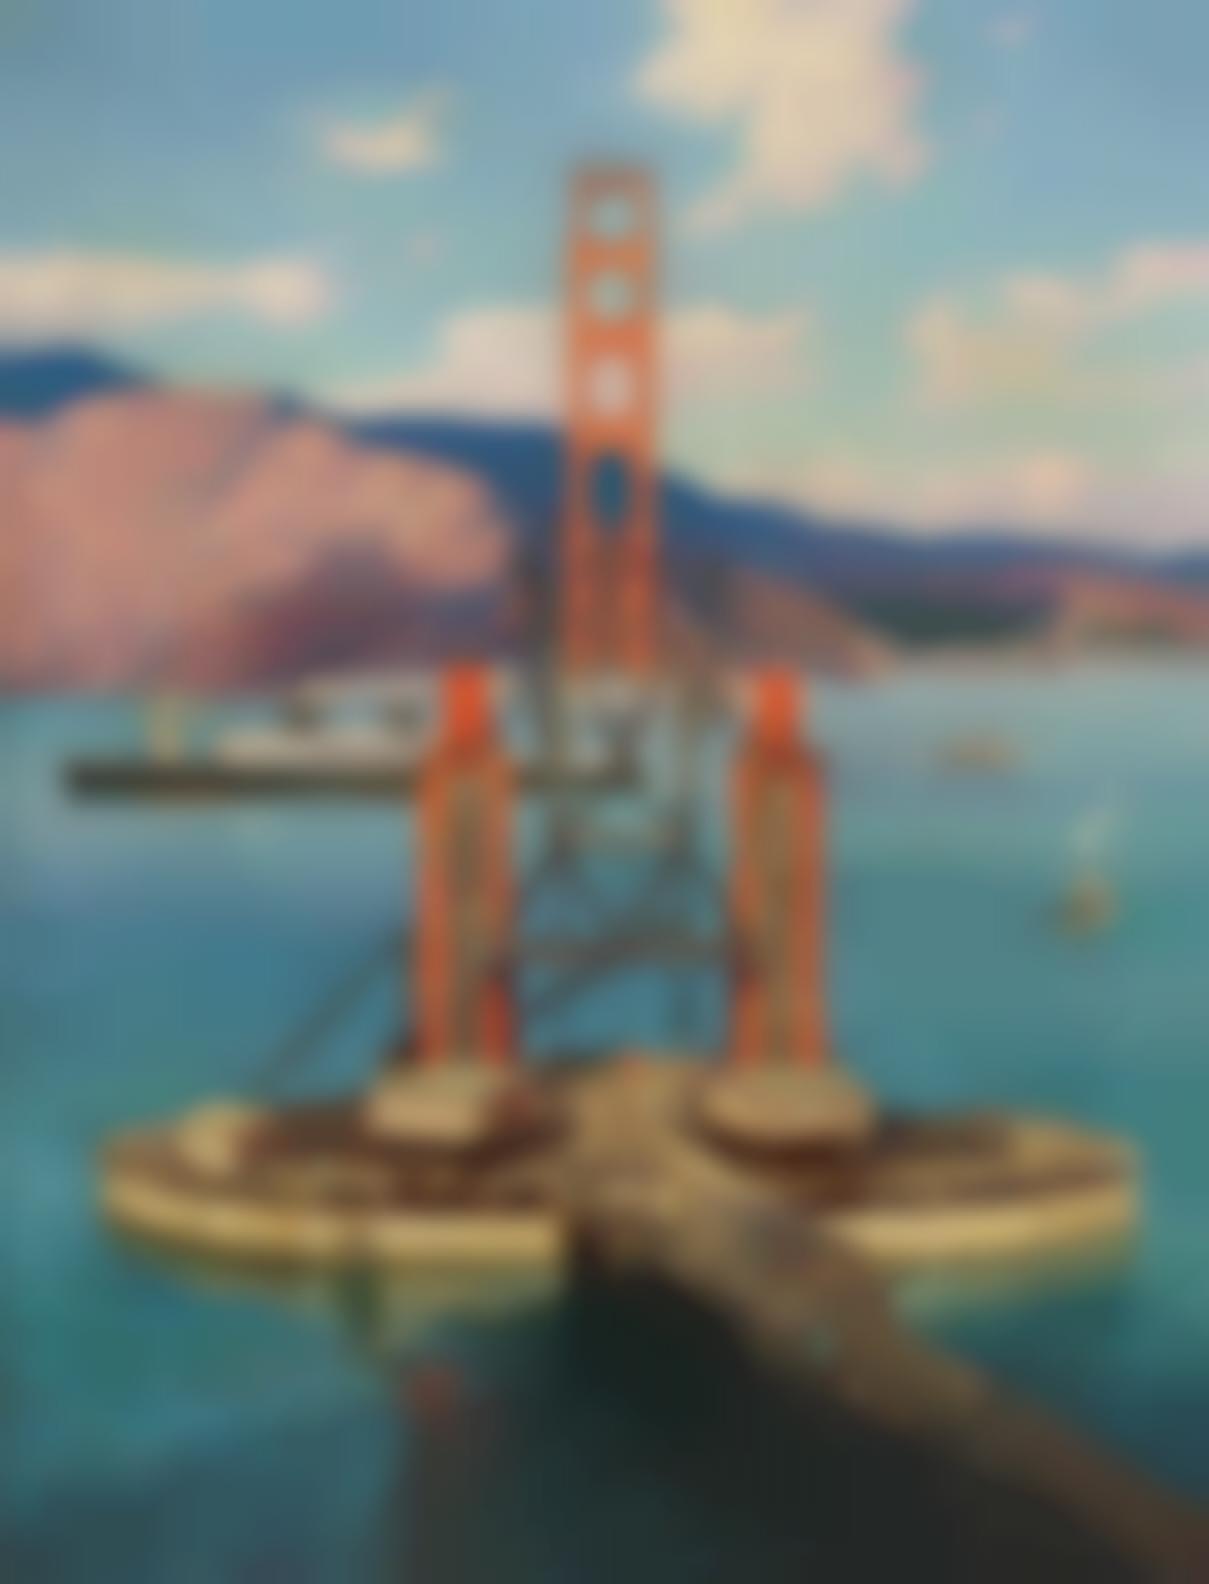 Walter L. Greene - The Construction Of The Golden Gate Bridge-1935